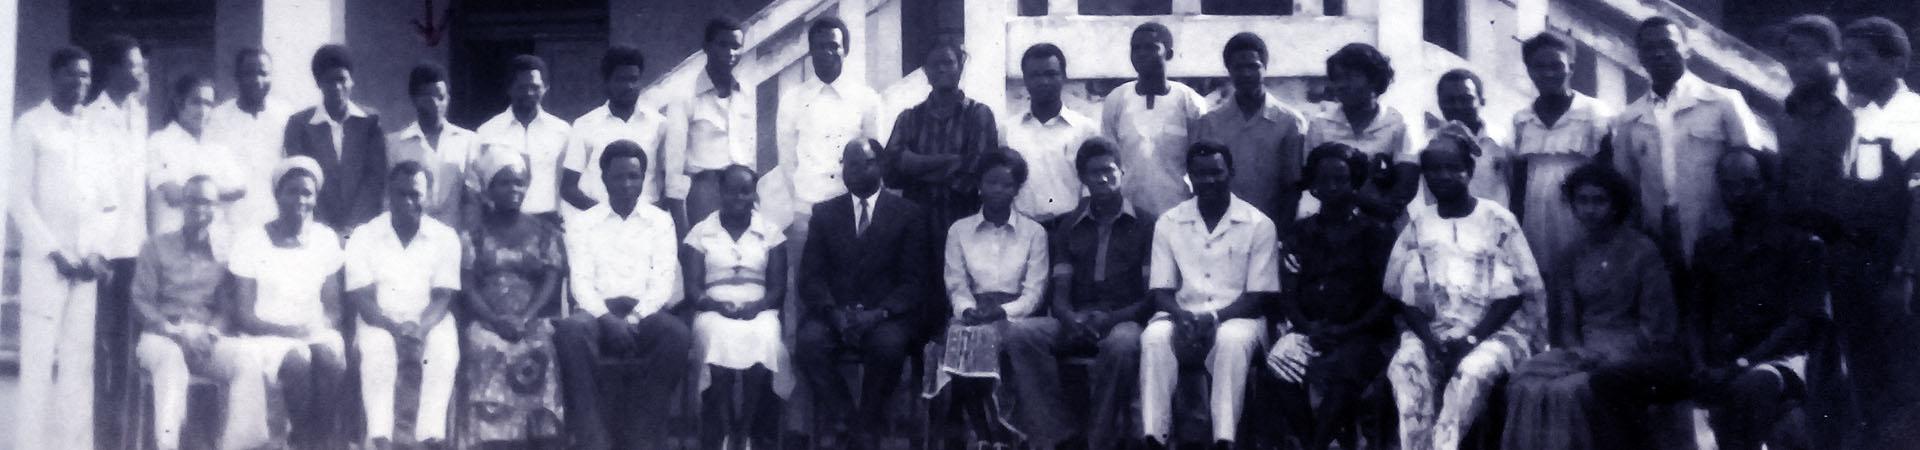 1978 Teachers (curtesy of Bankole Ogungbade)